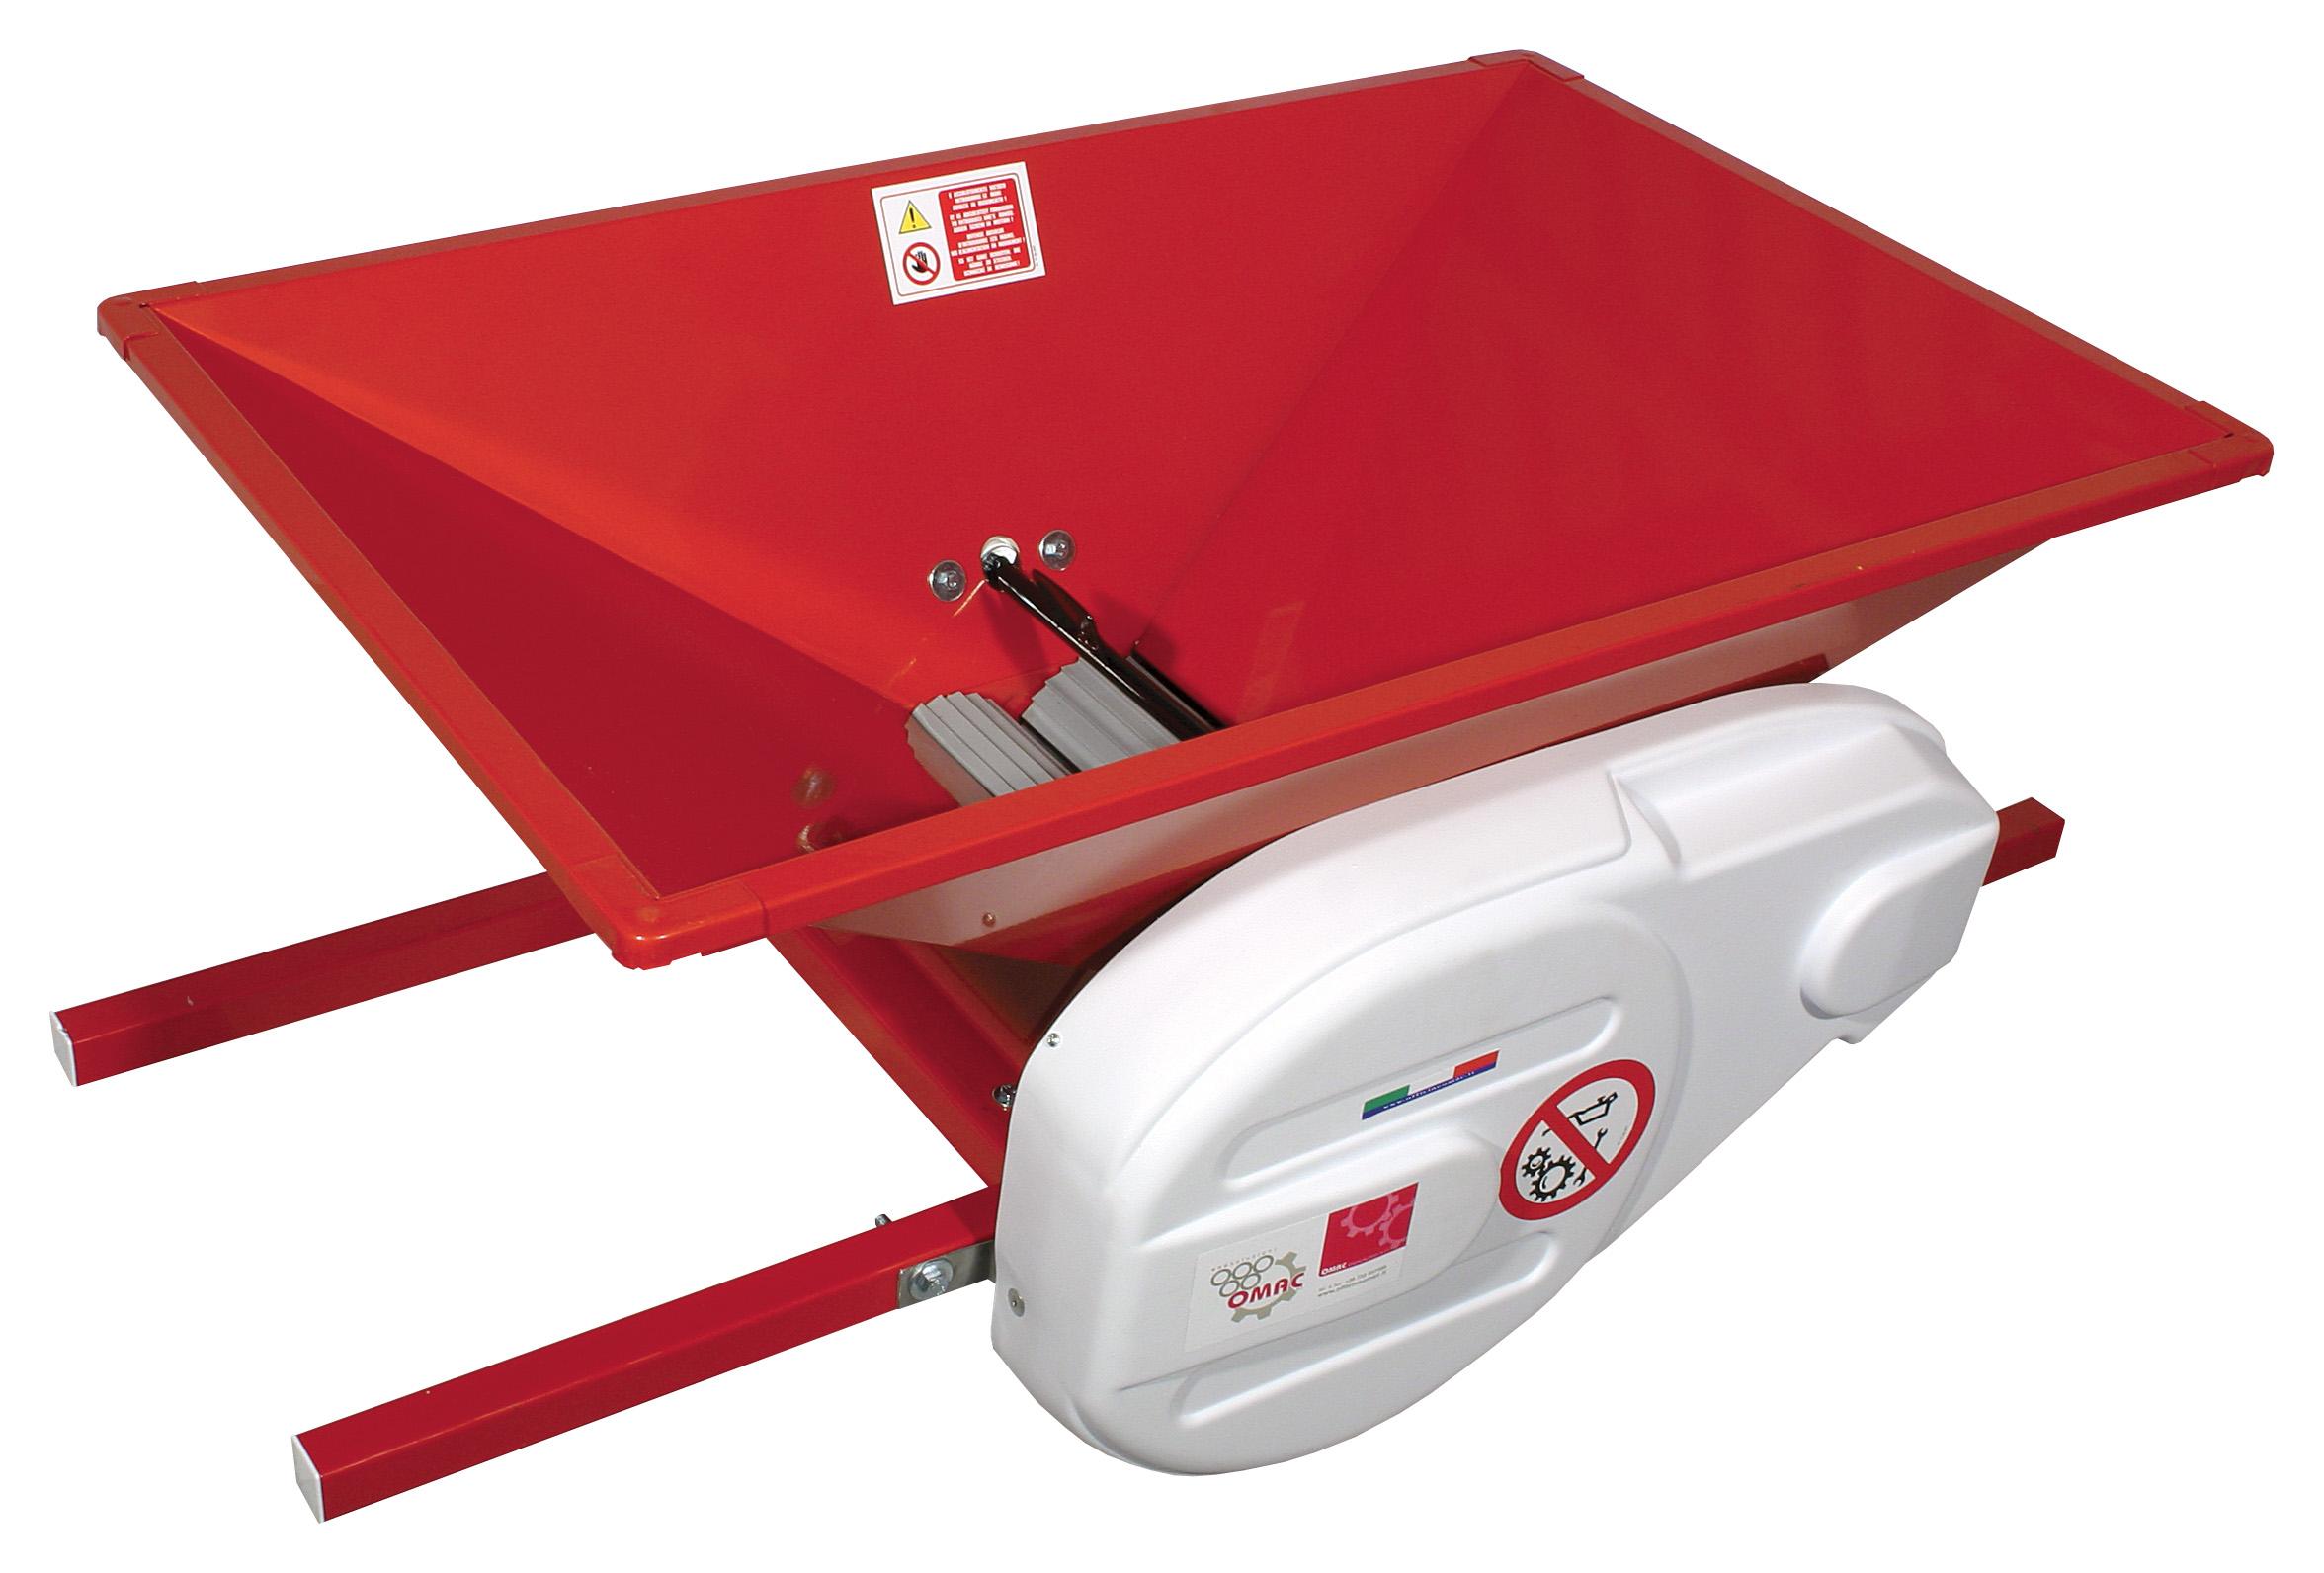 OMAC PGE - 111.104 σπαστήρας σταφυλιών ηλεκτρικός 1,0 Hp